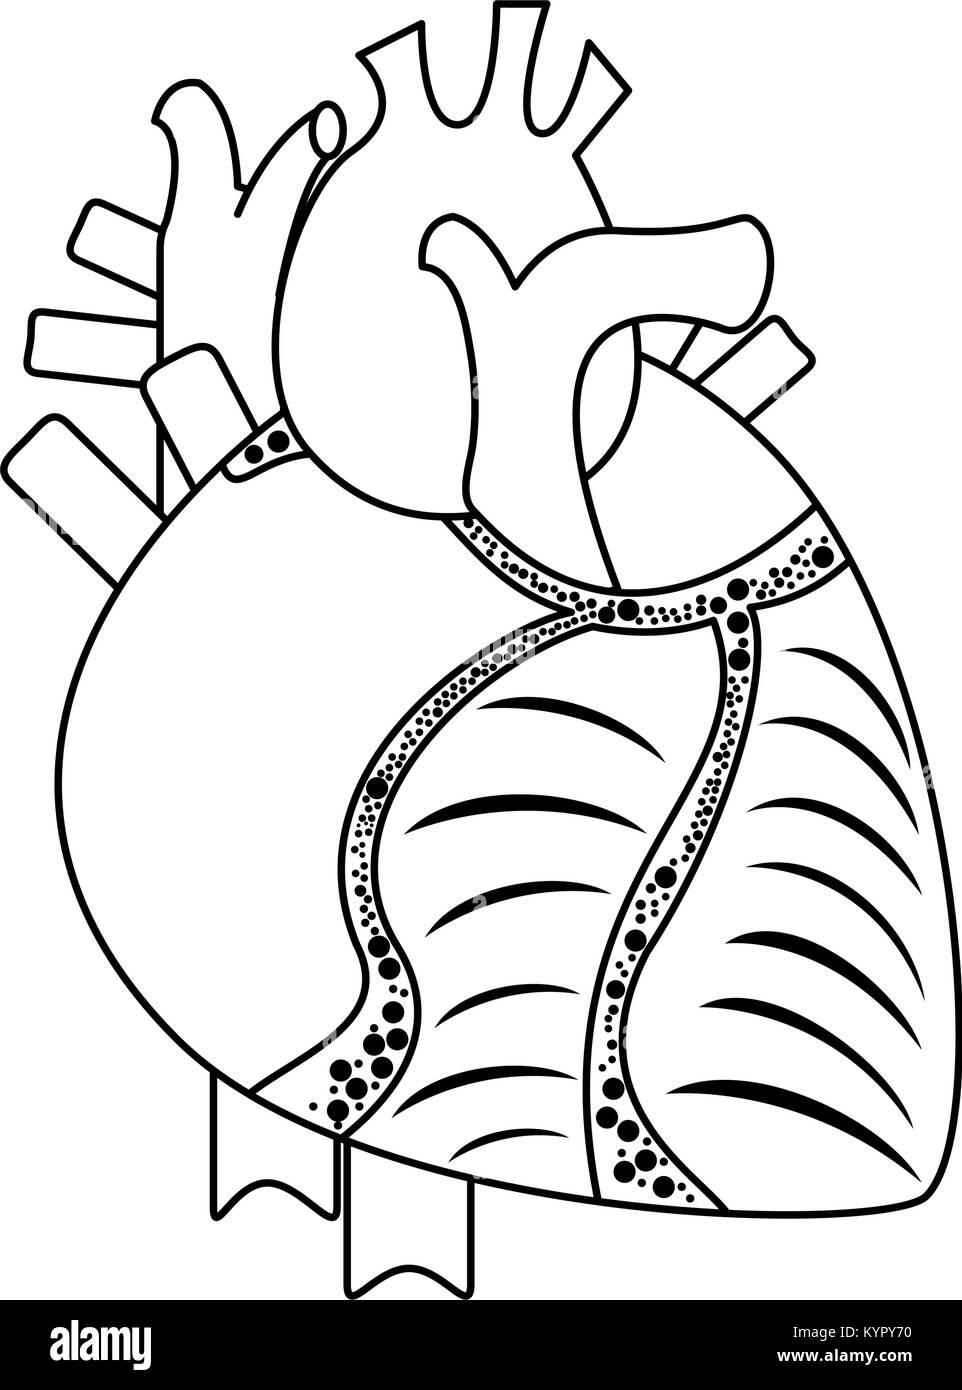 Human heart organ - Stock Image